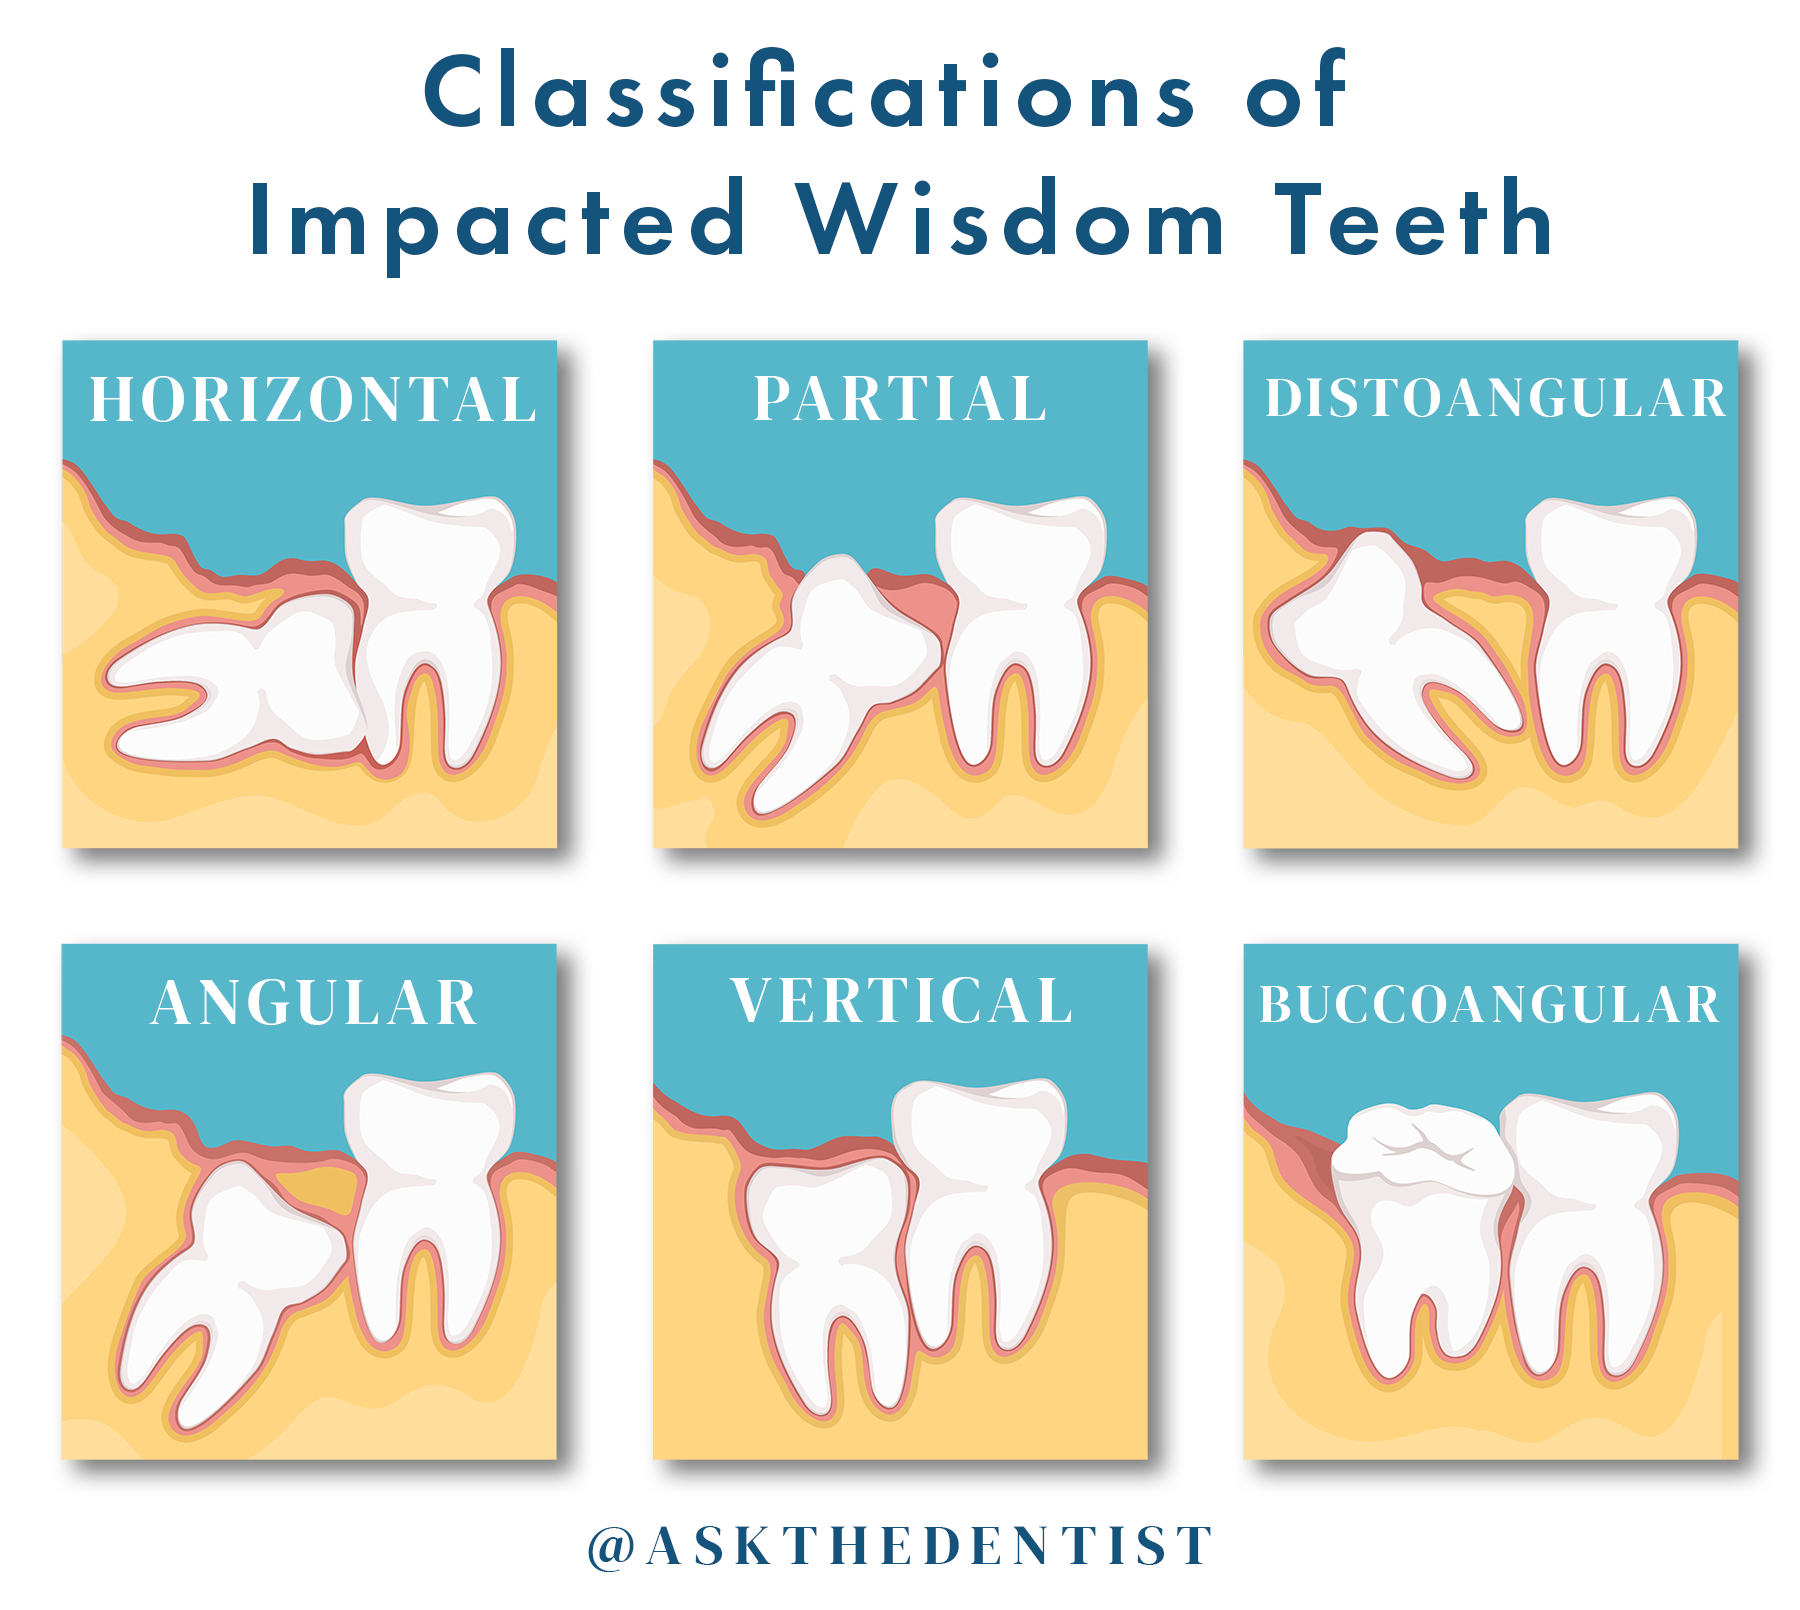 Classifications of Impacted Wisdom Teeth